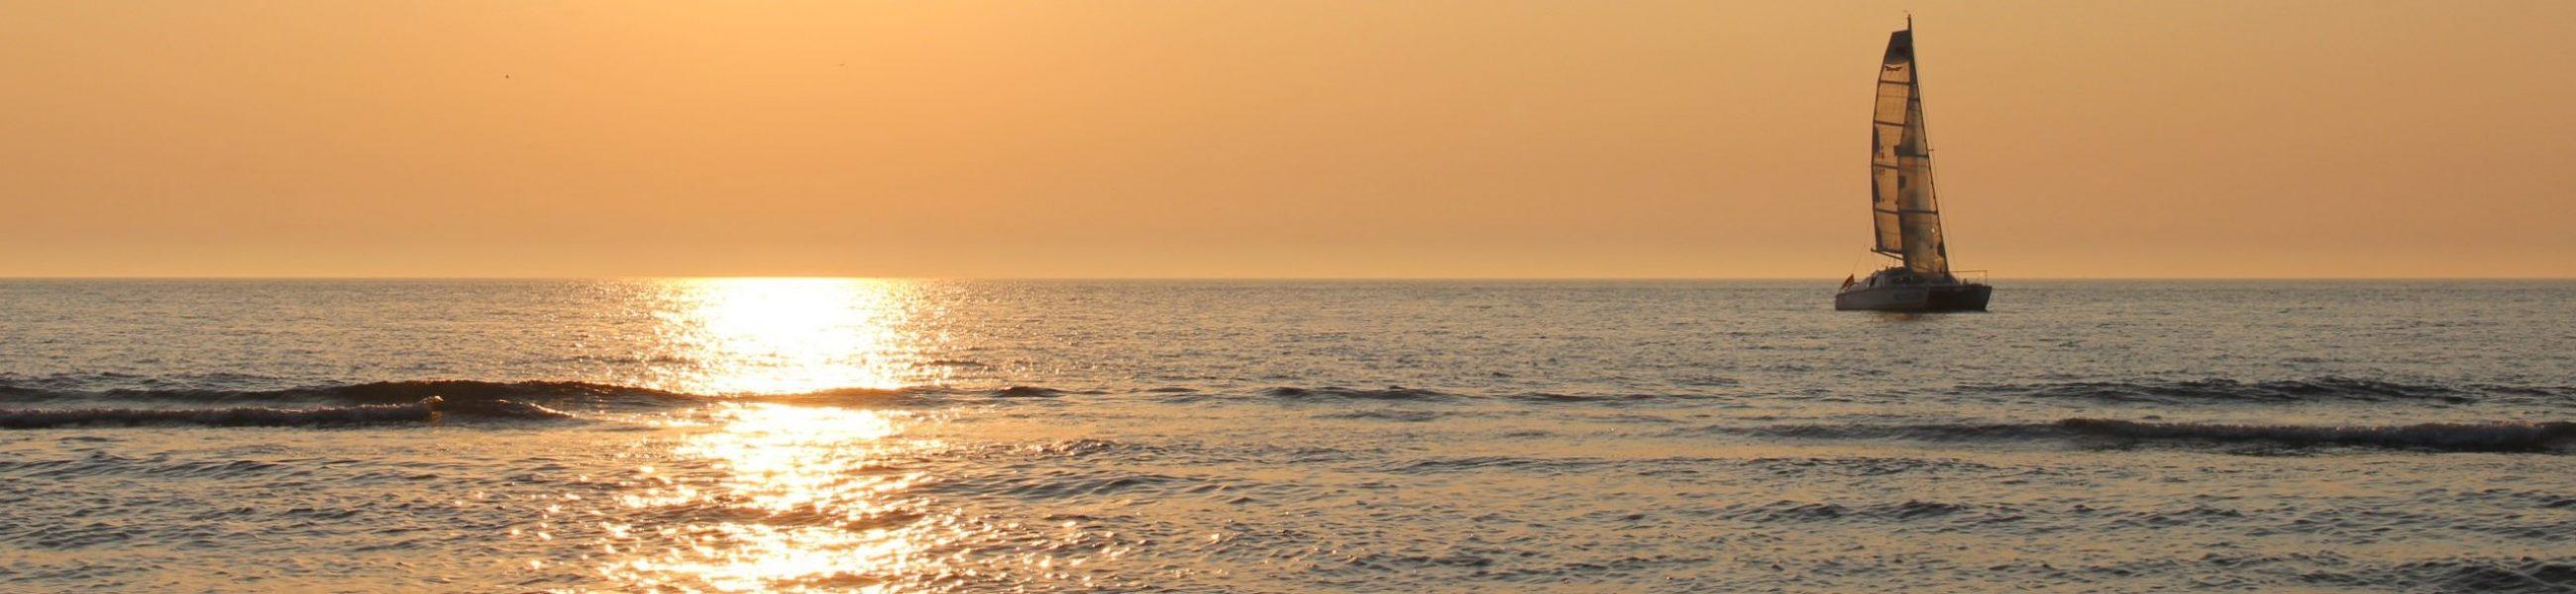 sunset-4041256